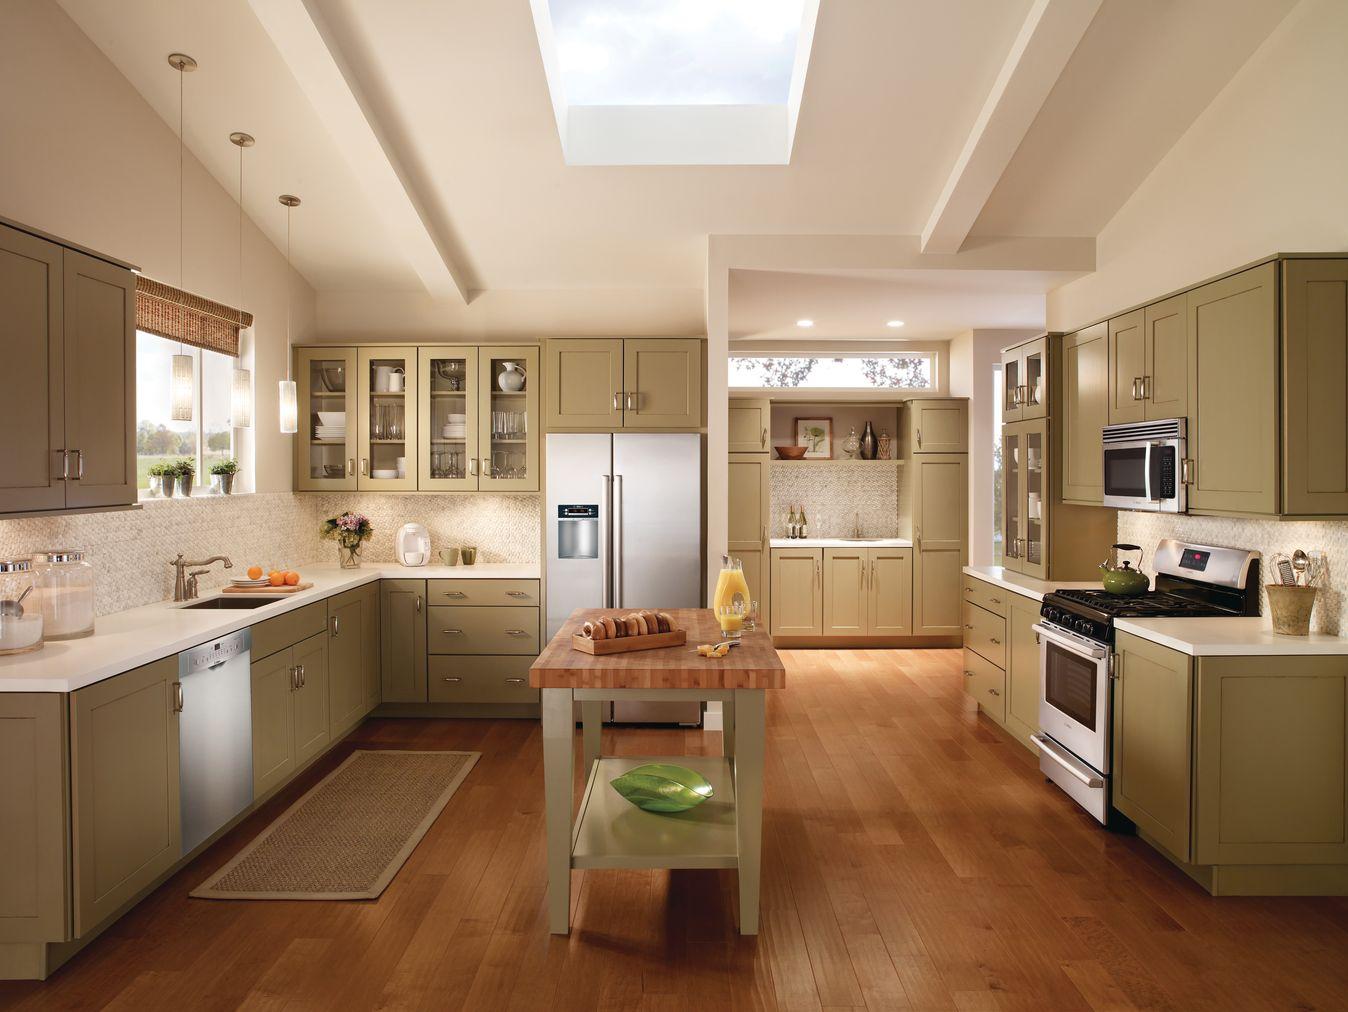 Ascenta®24 '' Recessed Handle DishwasherSHE3AR75UCStainless steel